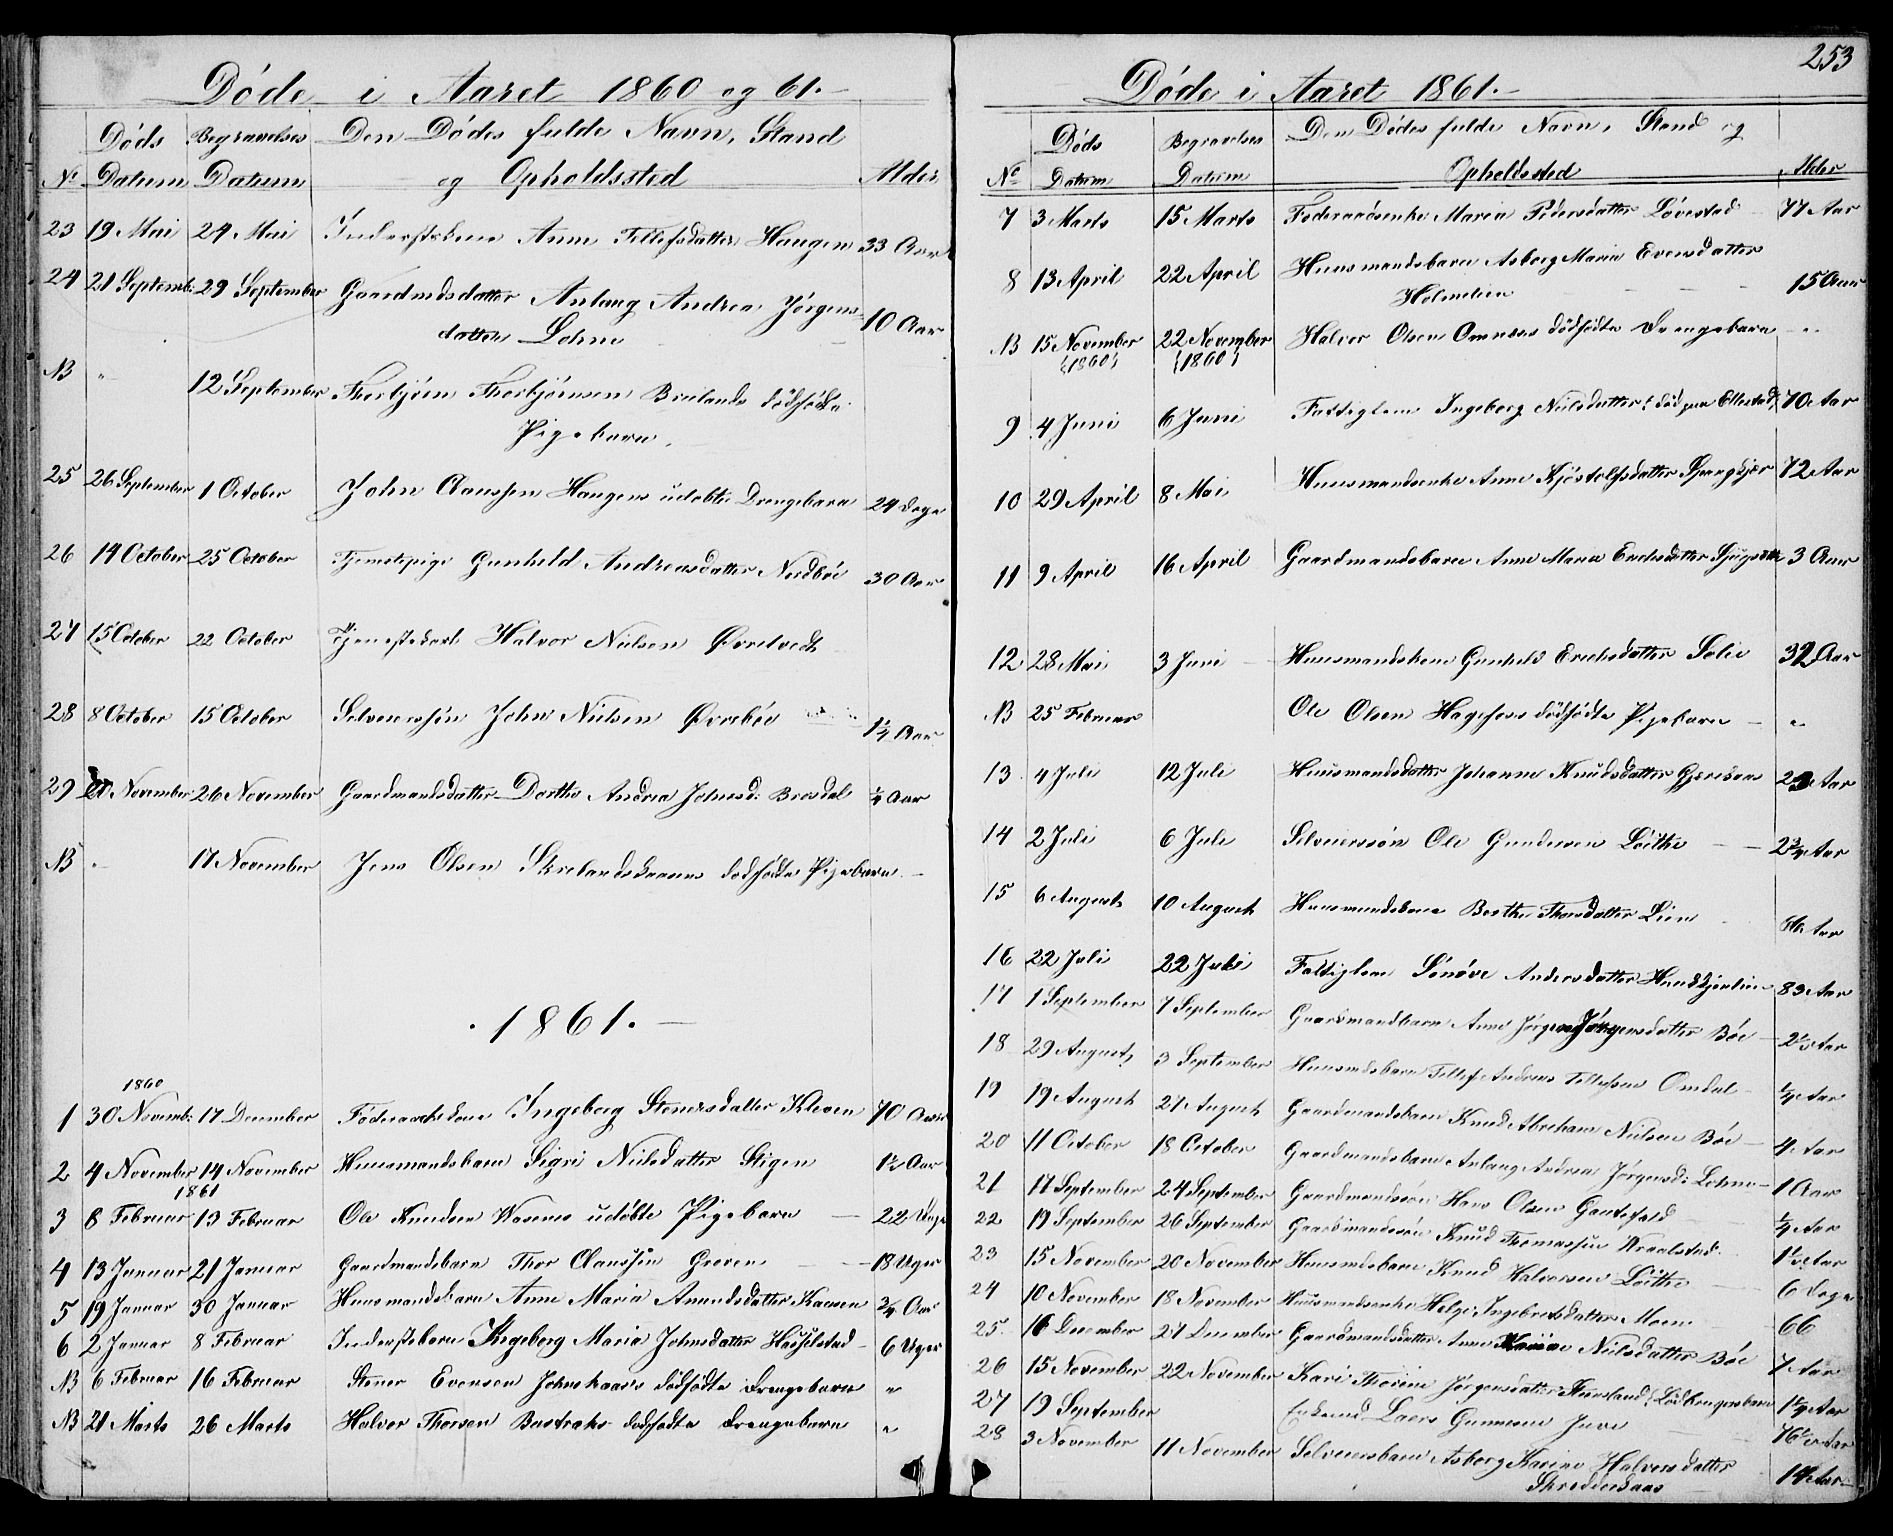 SAKO, Drangedal kirkebøker, G/Gb/L0001: Klokkerbok nr. II 1, 1856-1894, s. 253